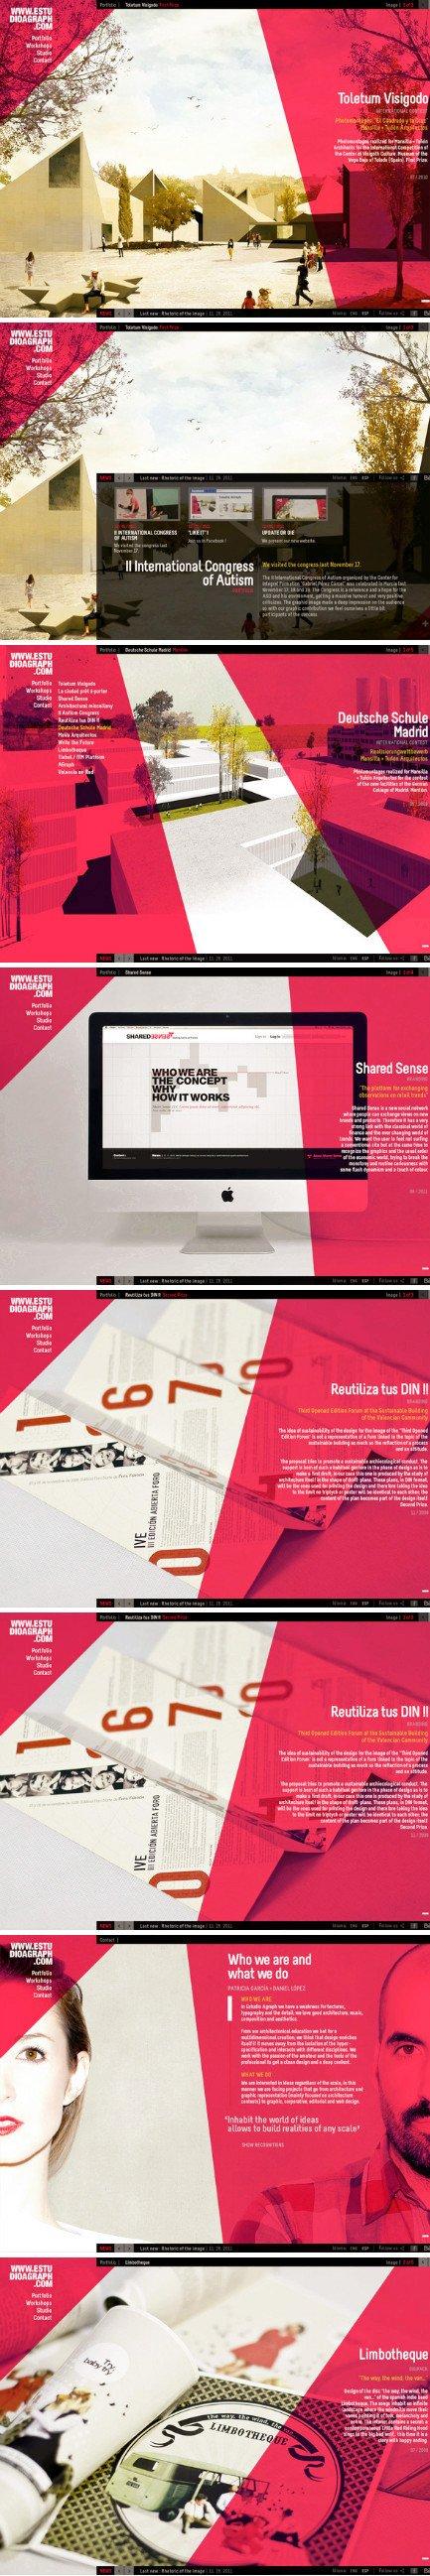 Pagina web arquitectura composci n visual foto planos for Arquitectura pagina web